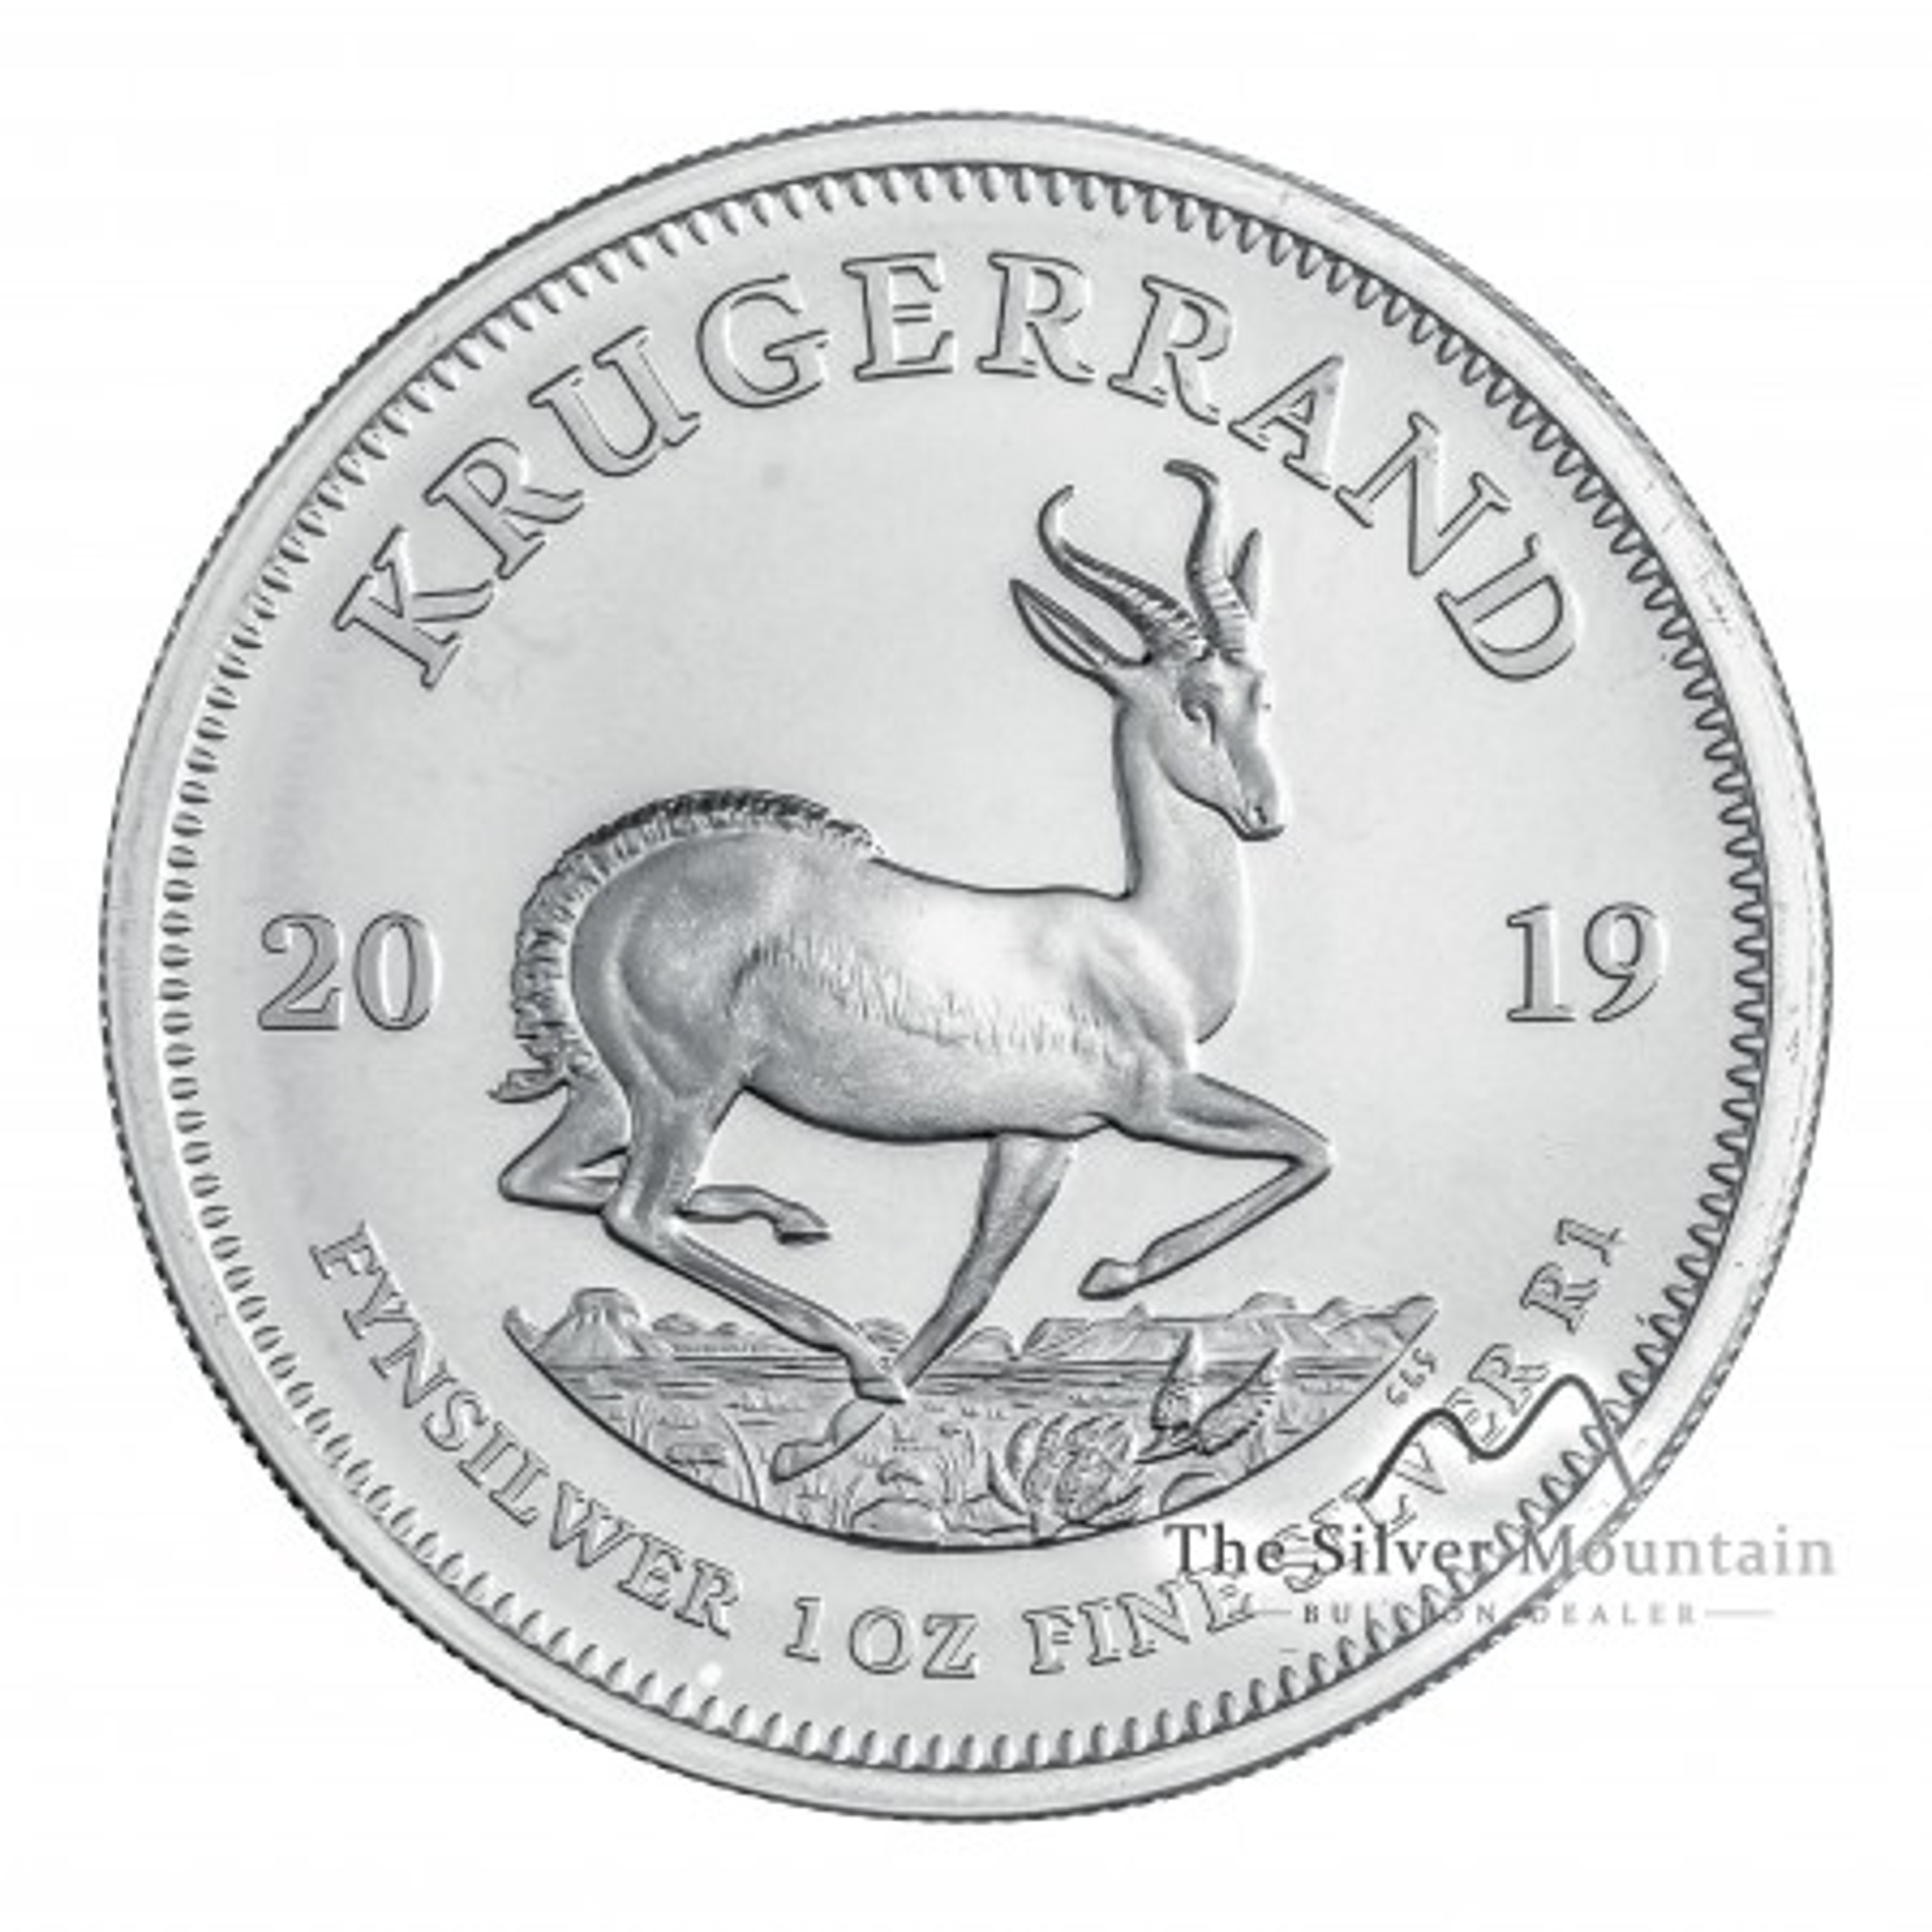 1 Troy ounce zilveren munt Krugerrand